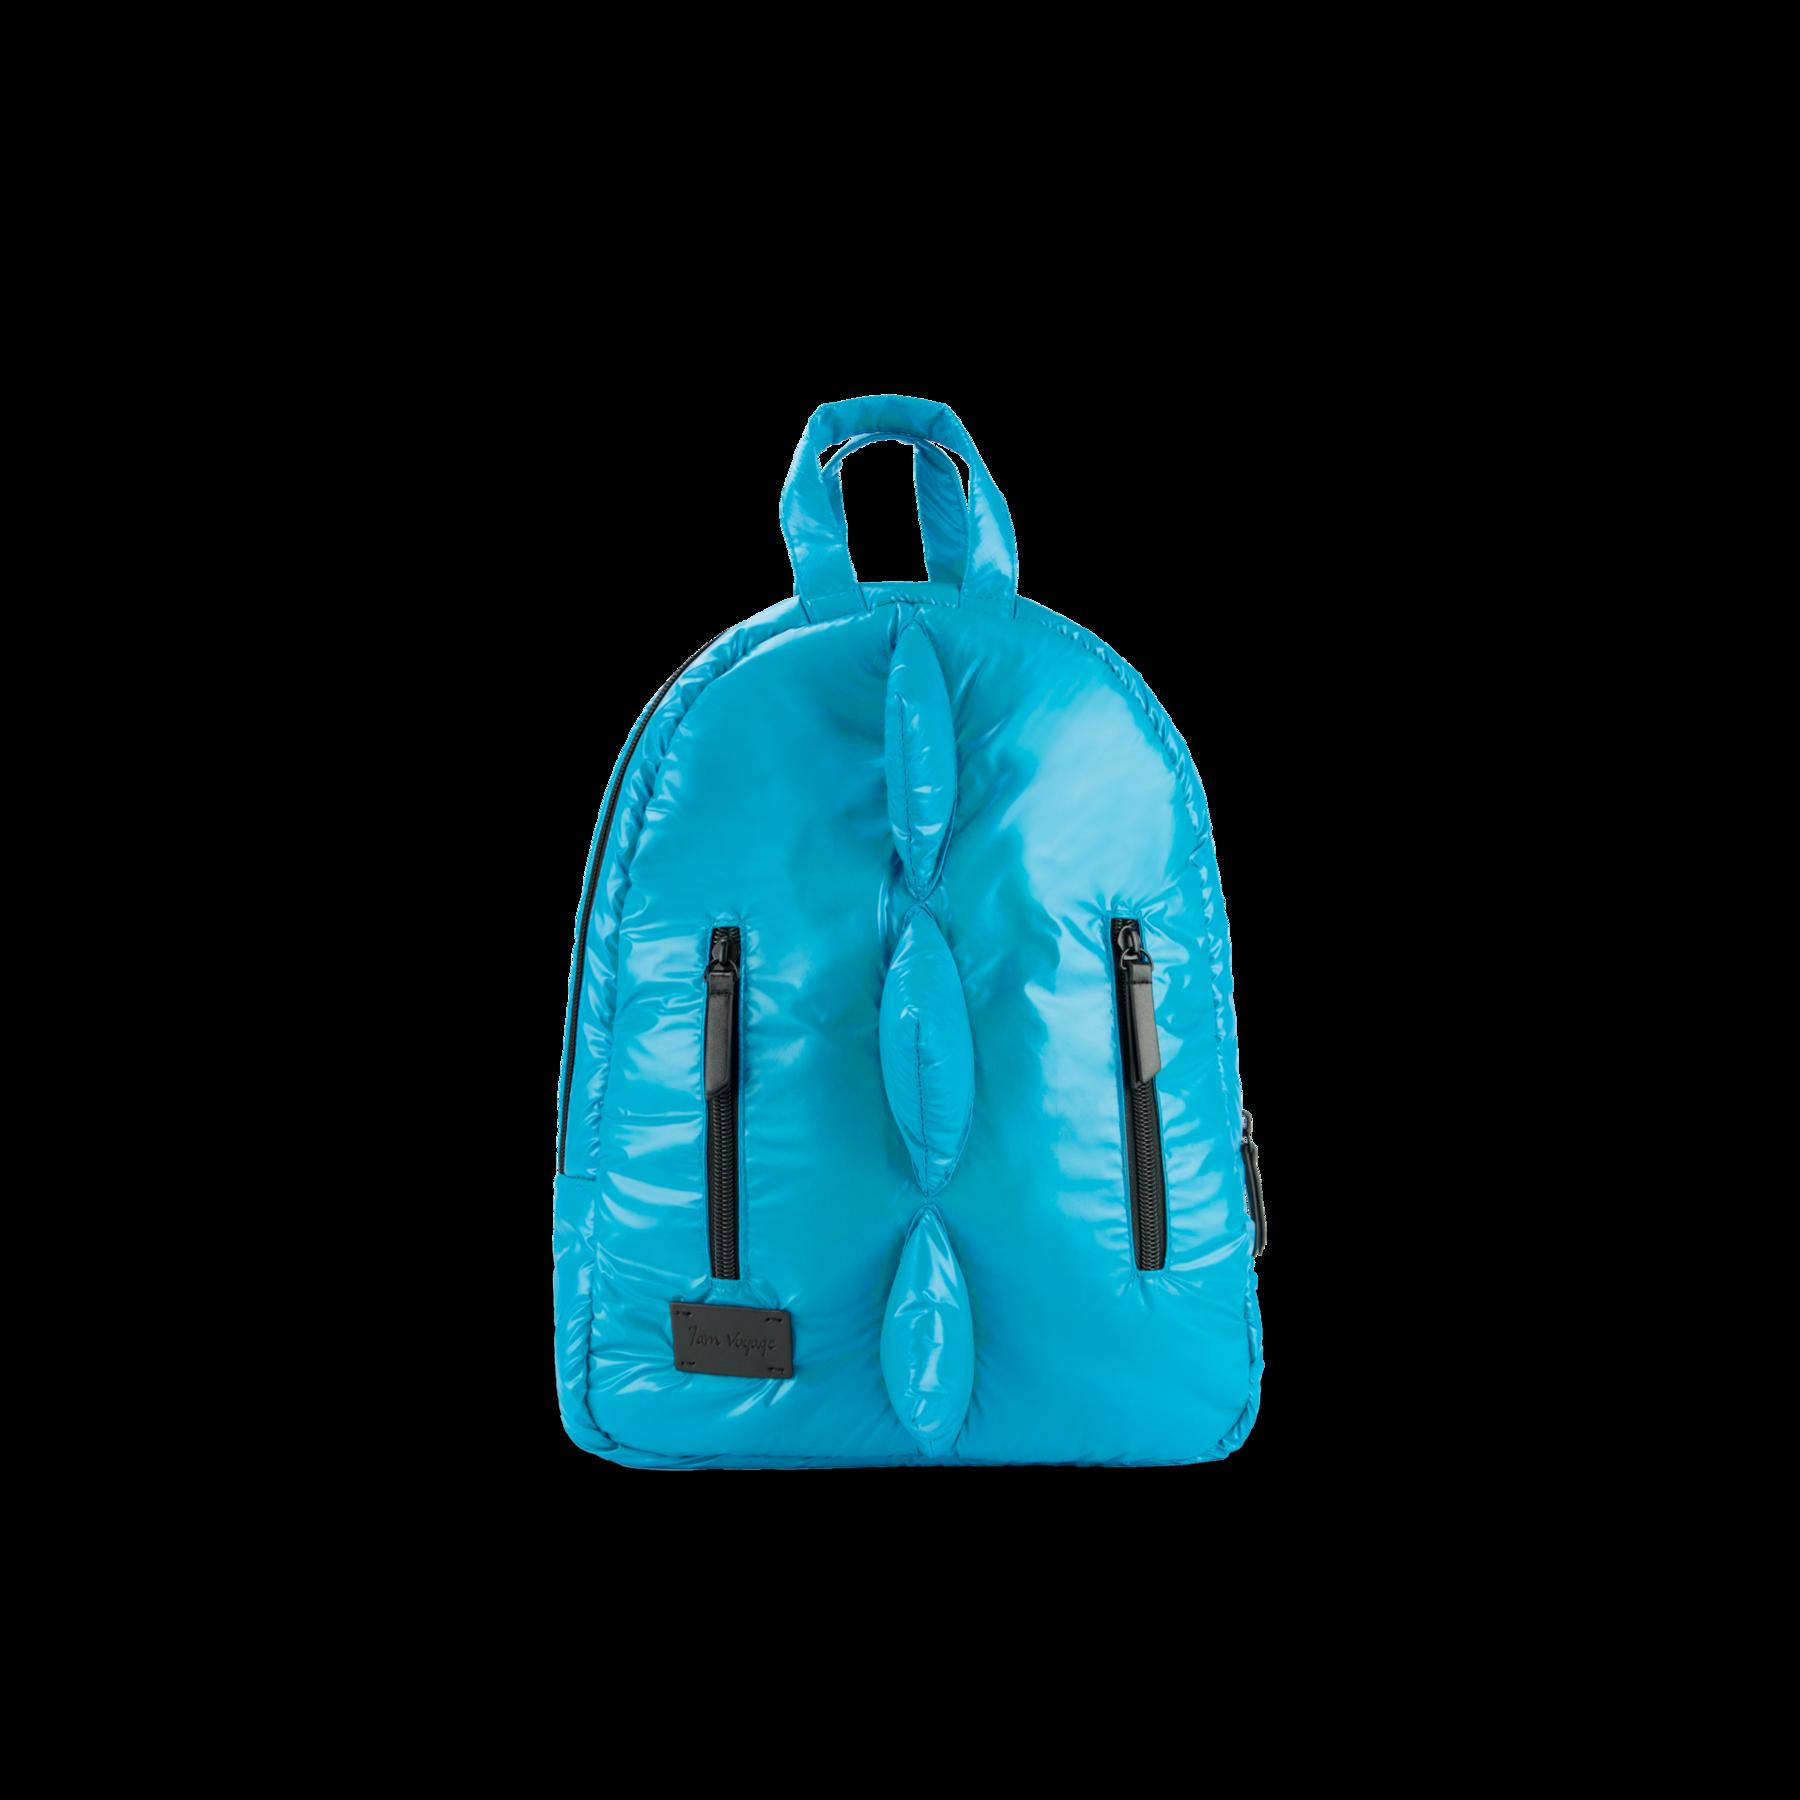 7AM - Plecak BackPack MINI DINO Turquoise